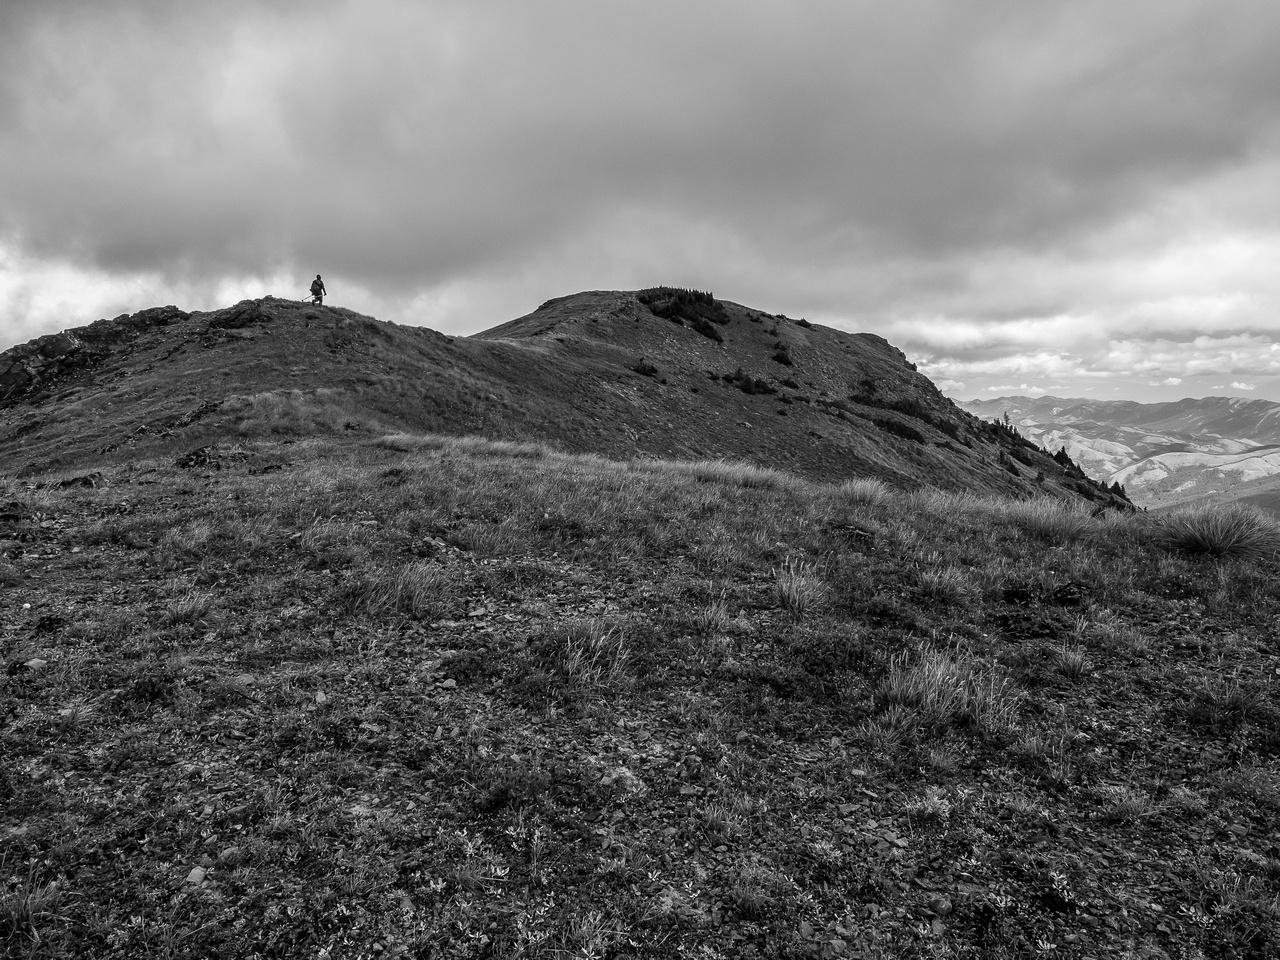 Hiking to the summit of McGillivray Ridge.